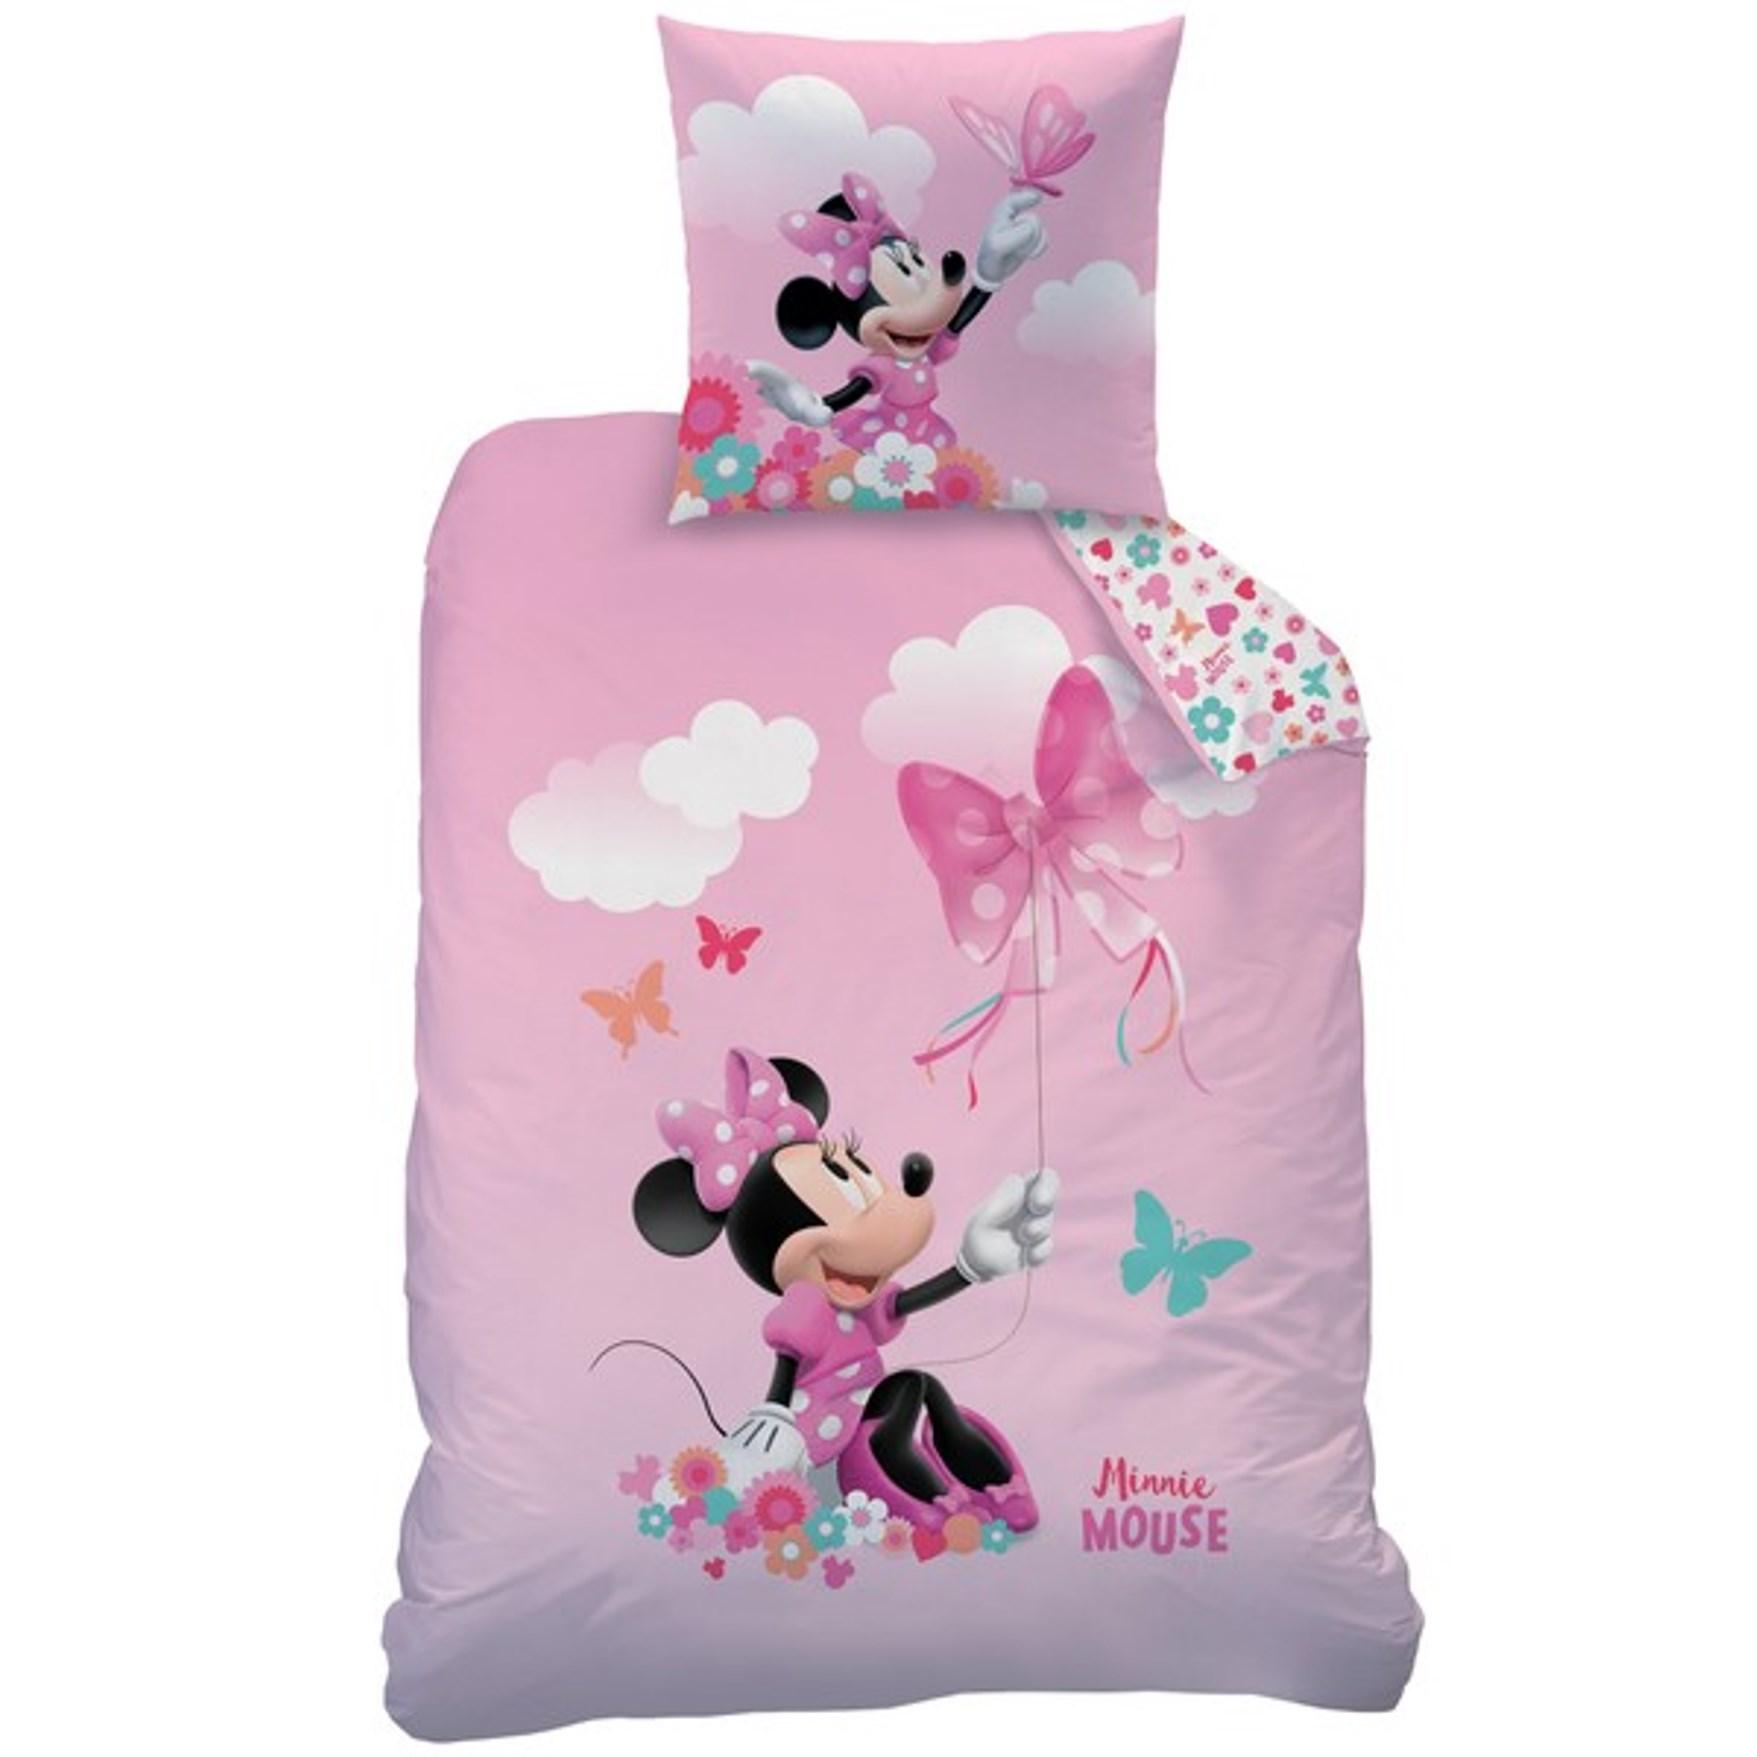 biber bettw sche disney minnie mouse 80 x 80 cm 135 x 200 cm flanell ebay. Black Bedroom Furniture Sets. Home Design Ideas